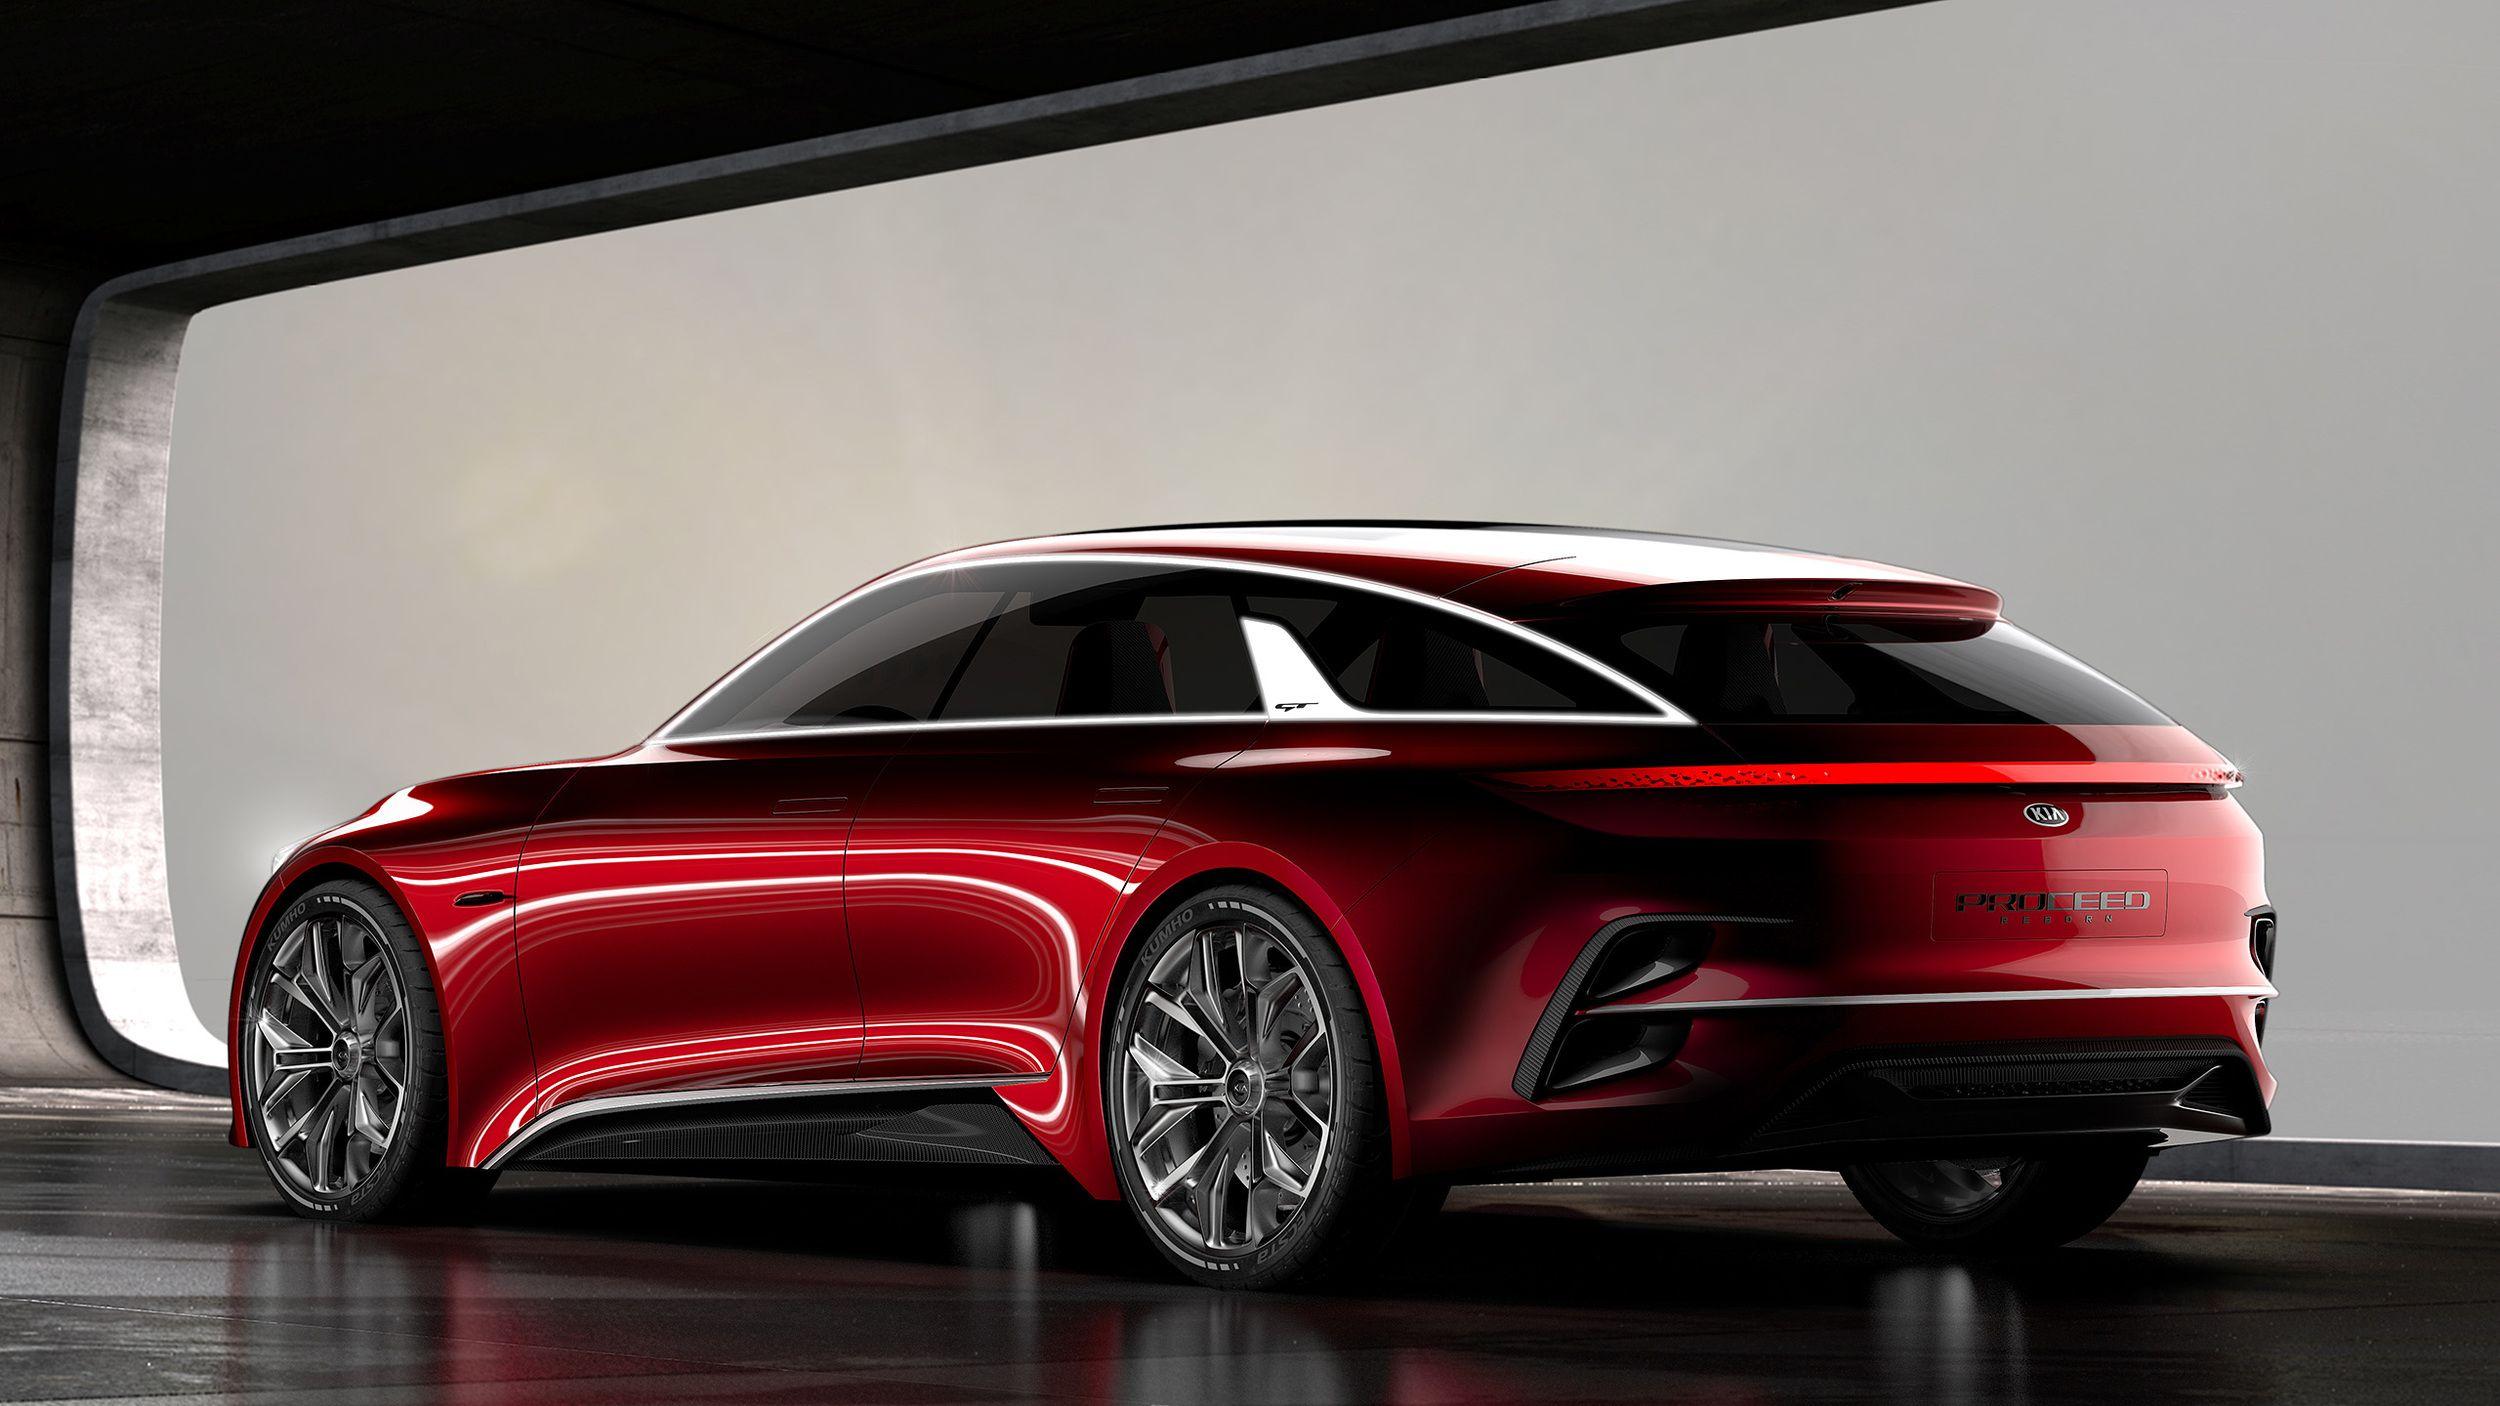 Kia Proceed S Nifty Details Automotive Perfumes And Lavish Design Touches Kia Concept Cars Car Images Kia proceed concept frankfurt motor show